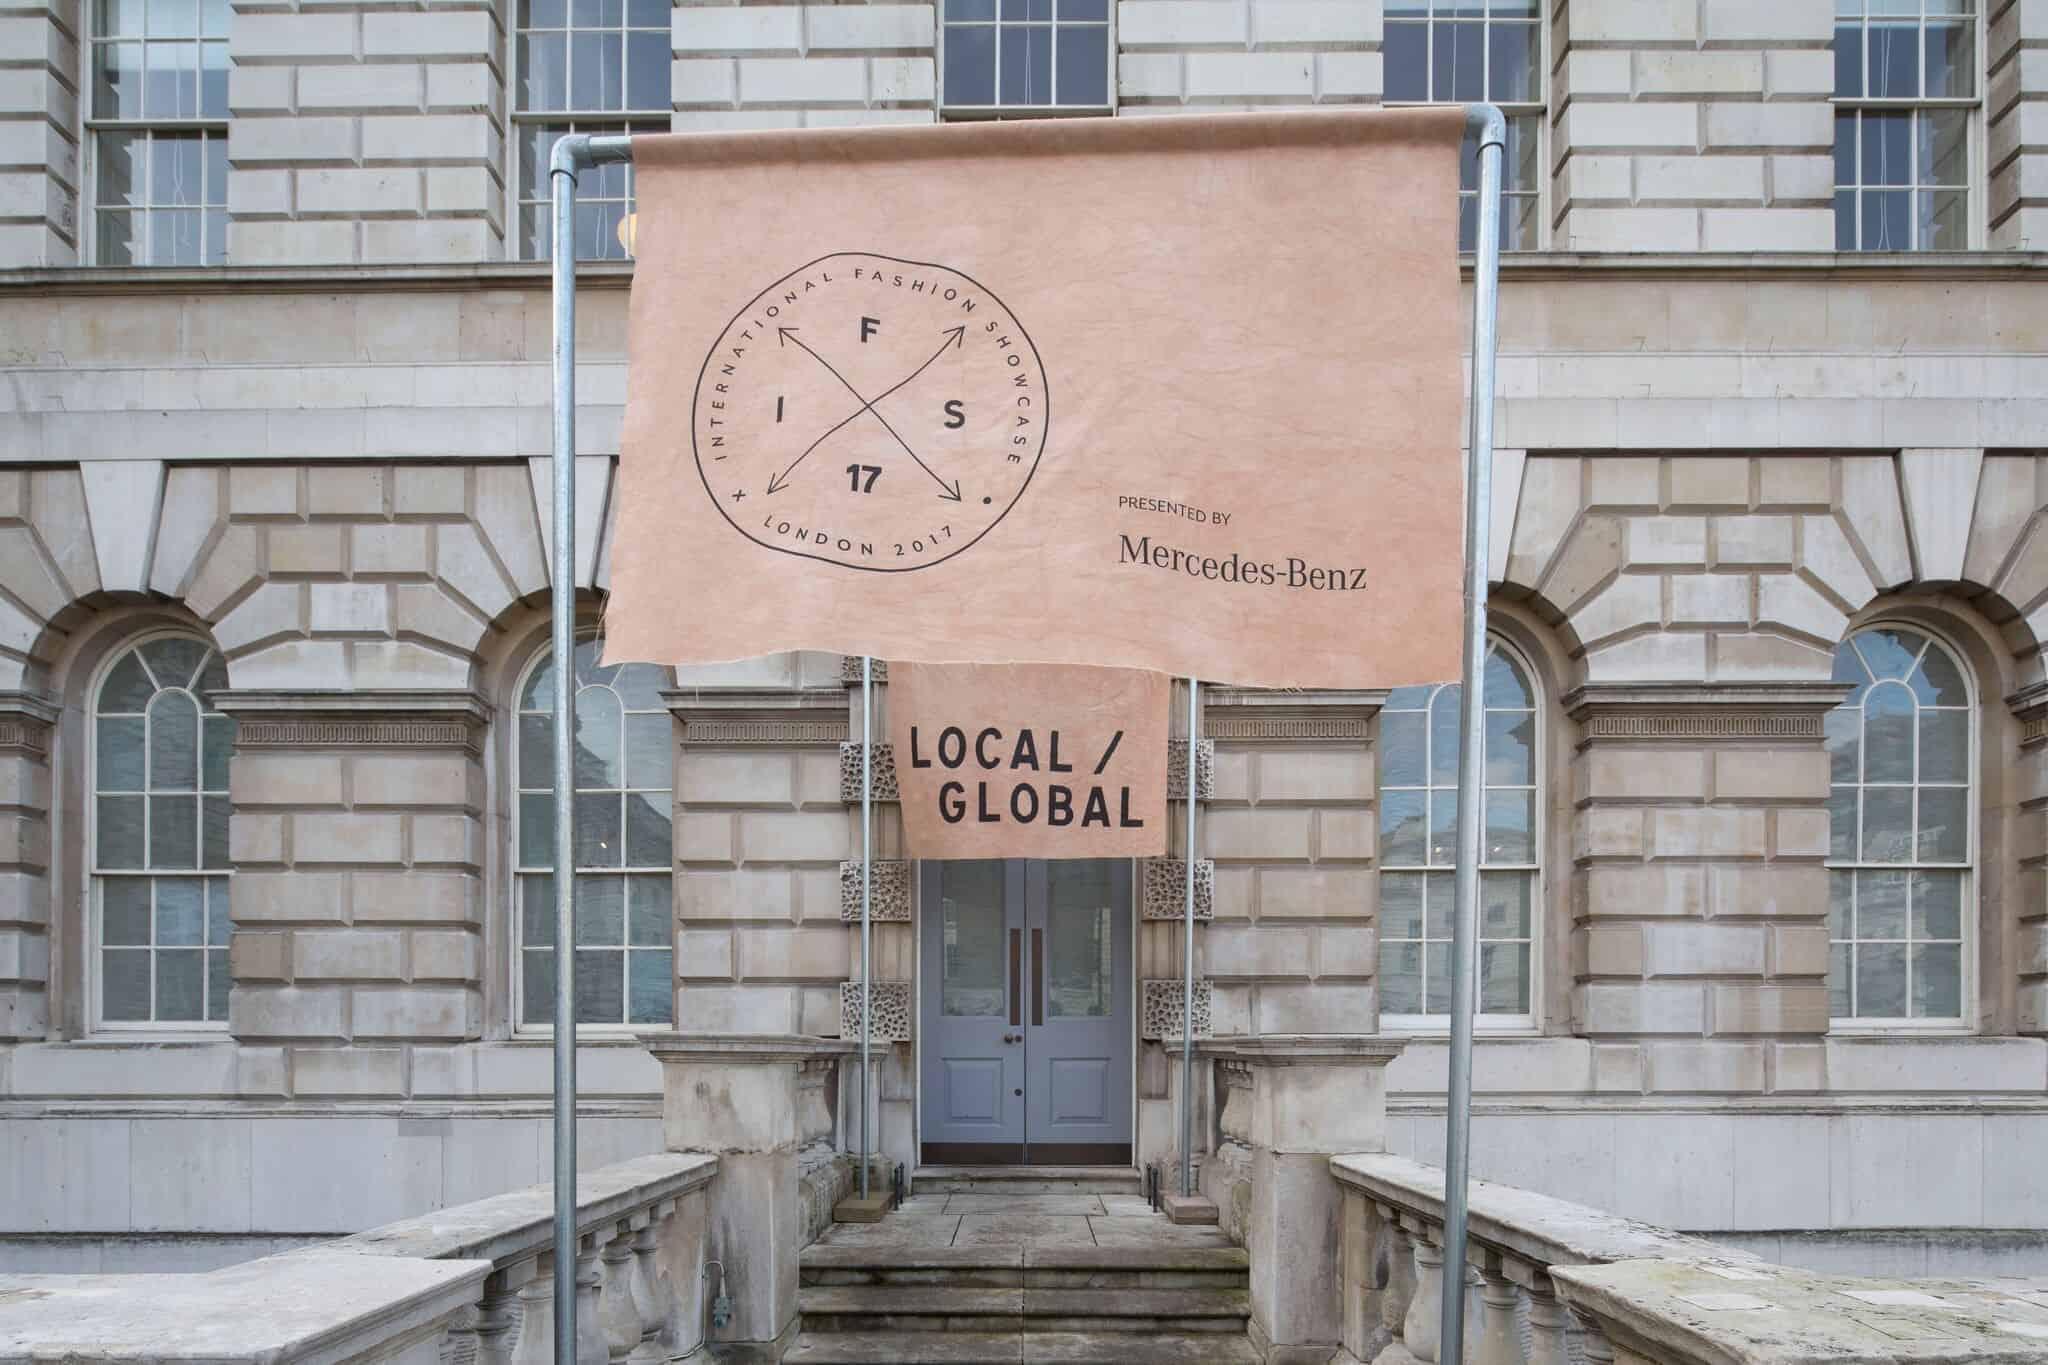 International Fashion Showcase 2017 Awards at Somerset House, London